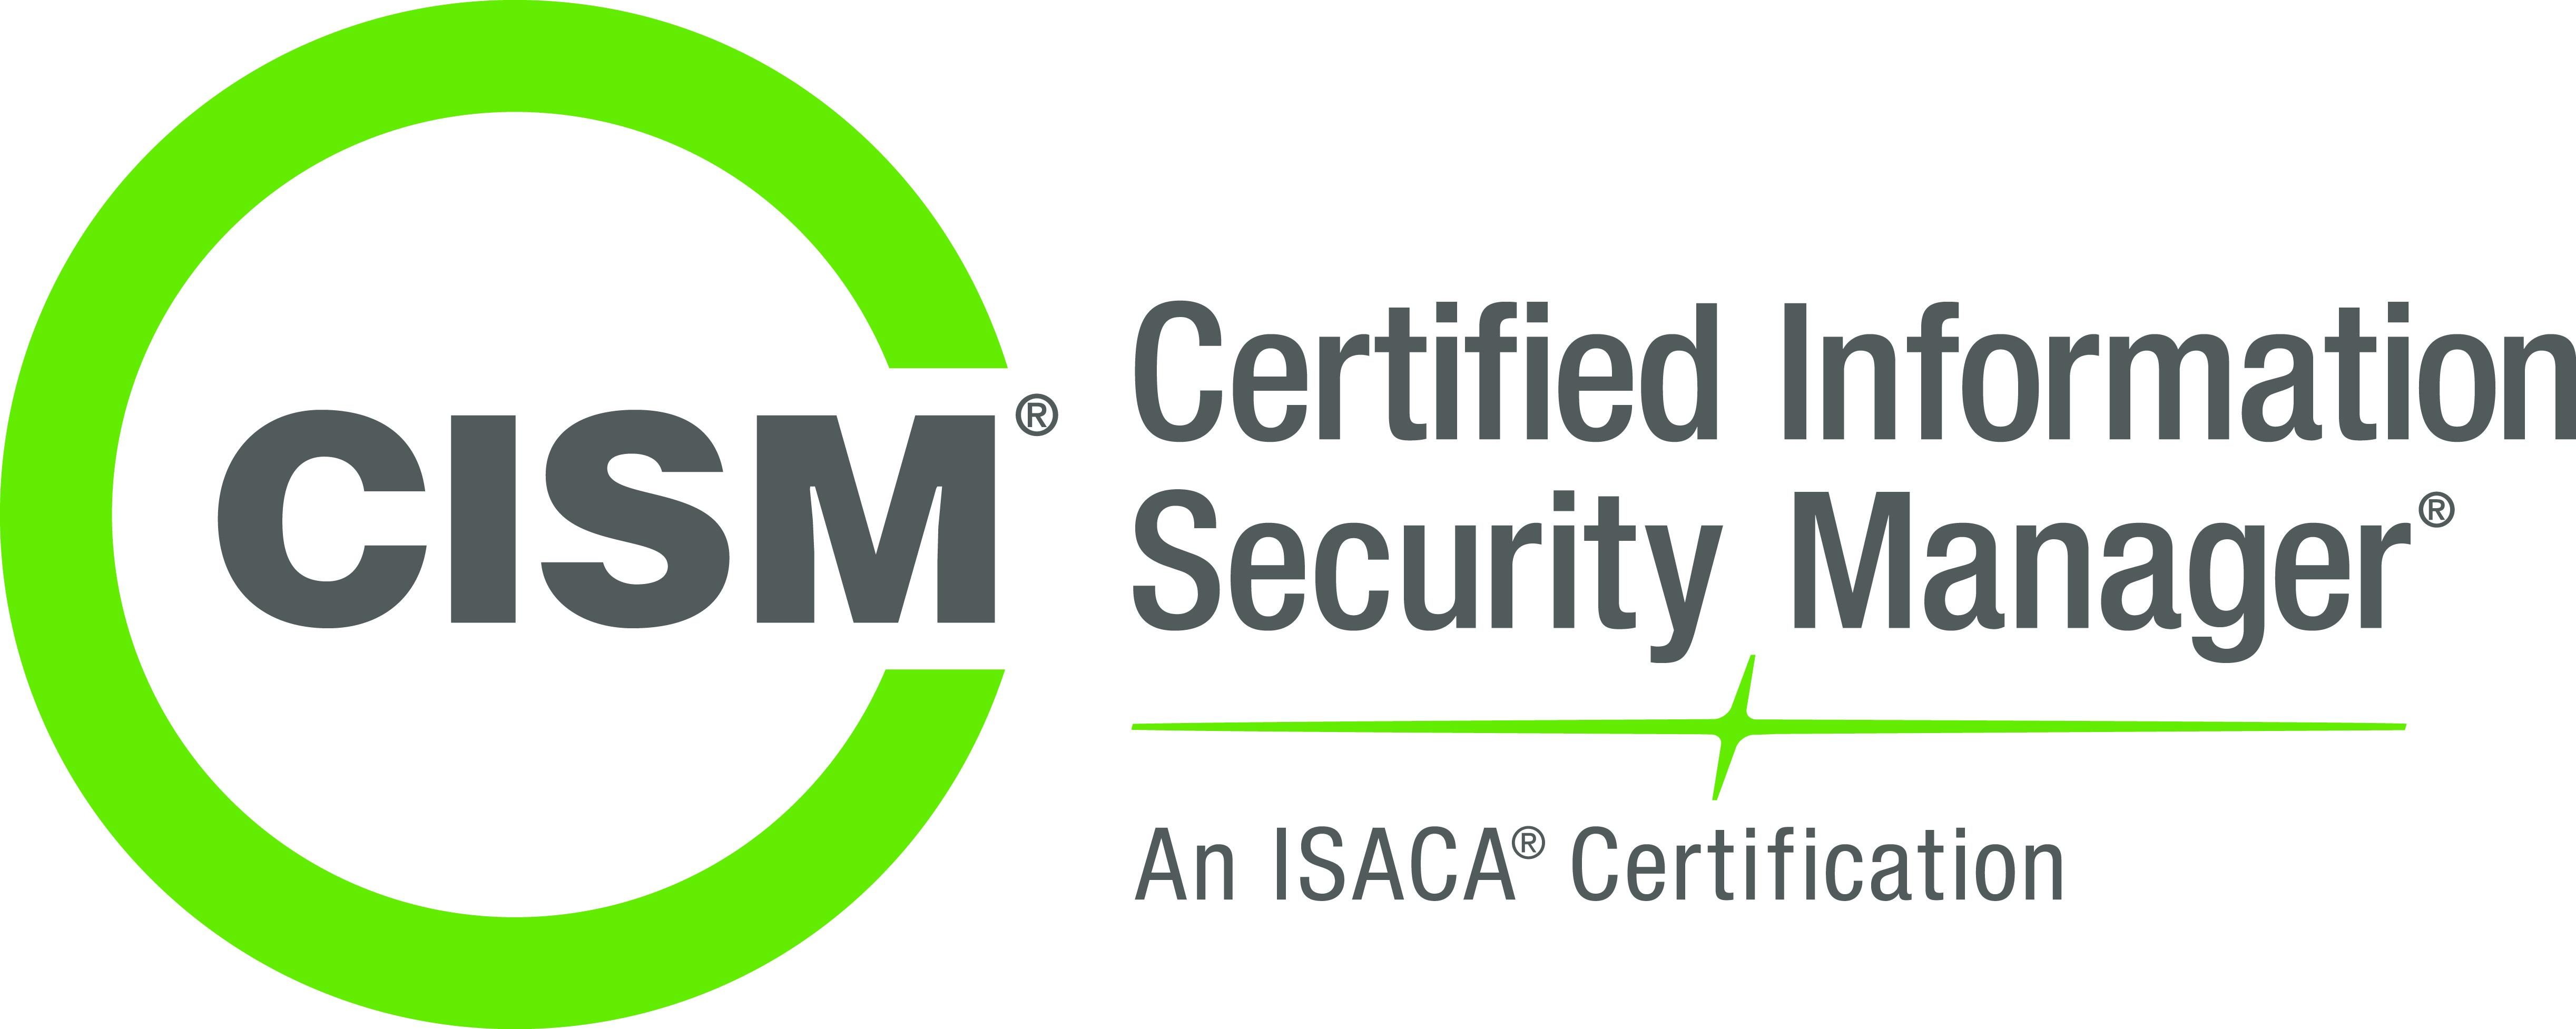 Cism online training | ISACA's CISM Training in Chennai |Cism certification  | Cism training